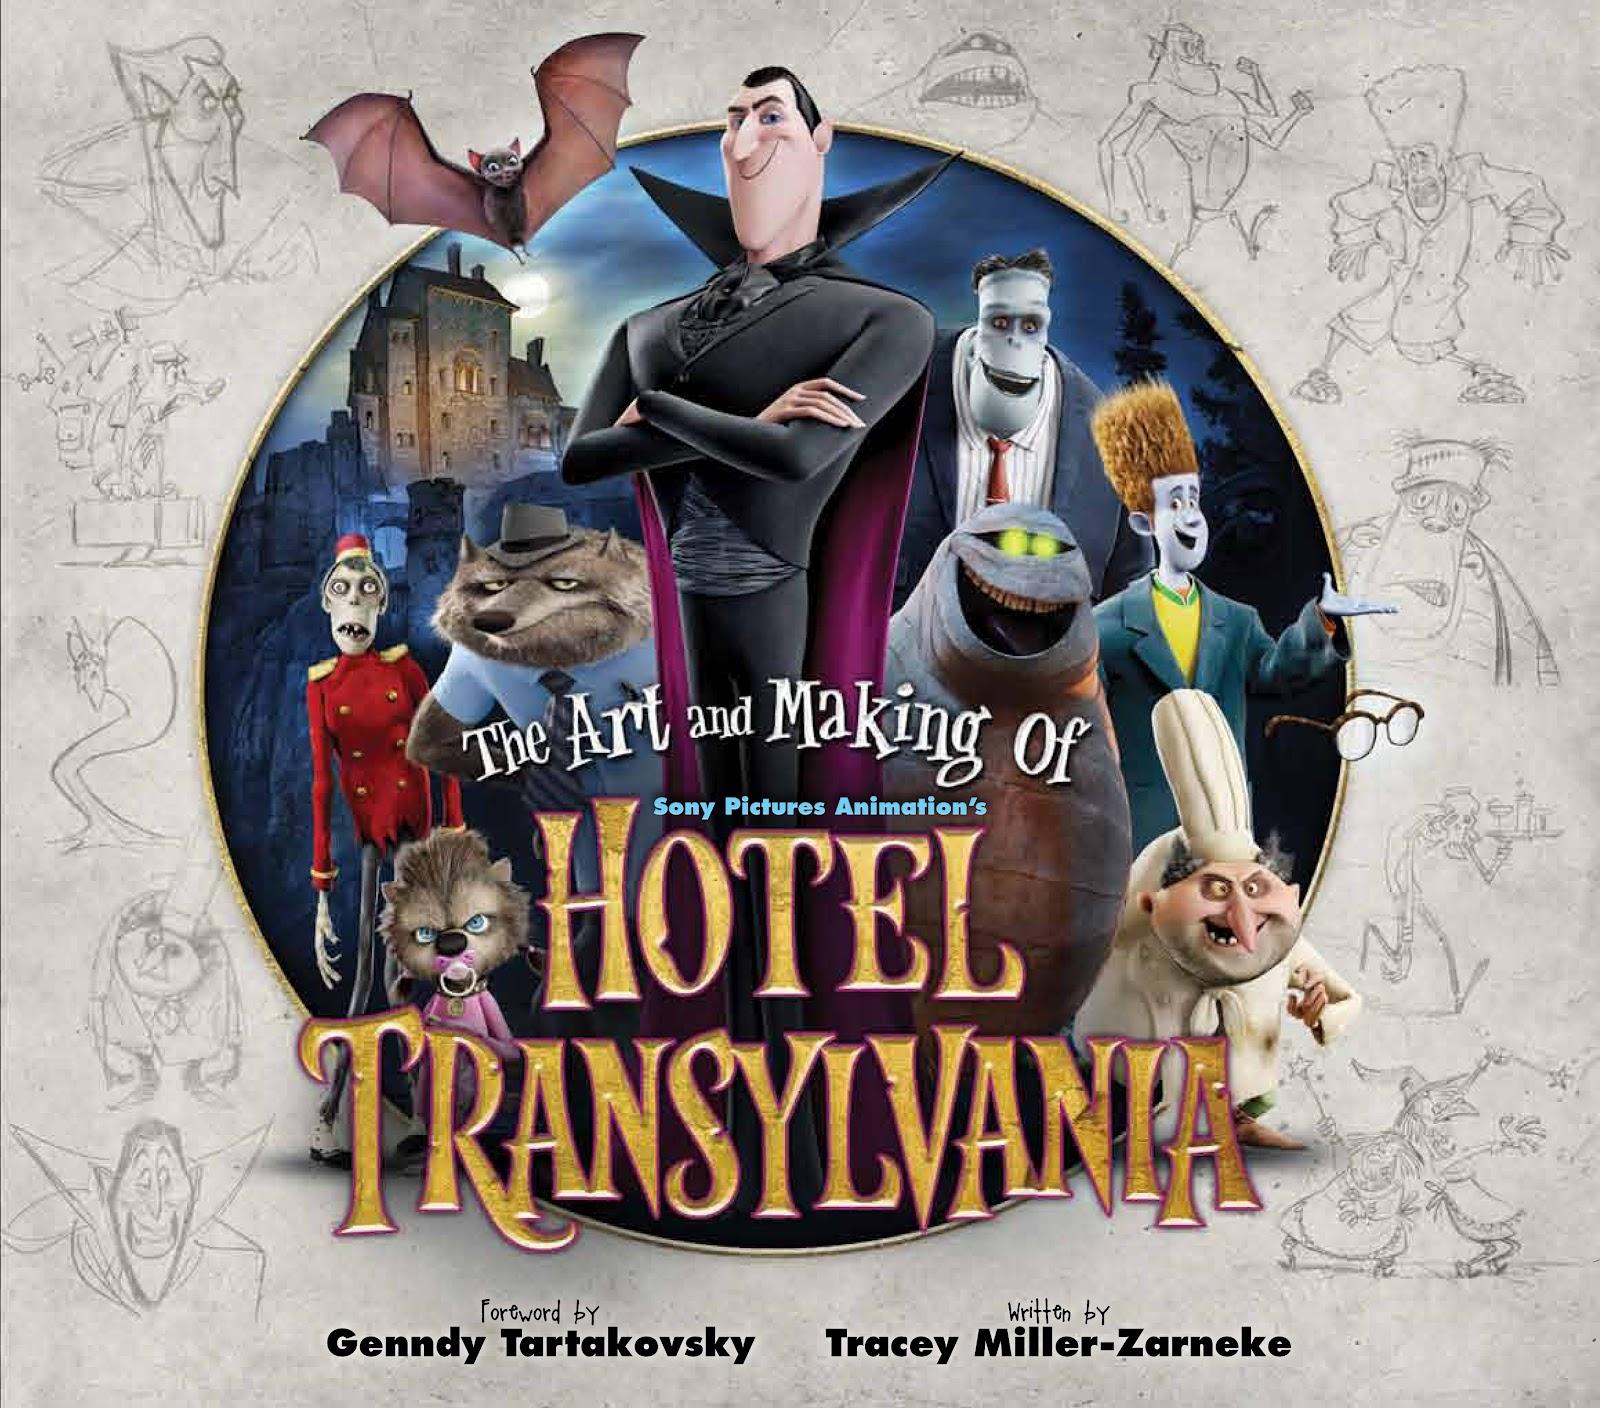 [Resim: The+Art+and+Making+of+Hotel+Transylvania.jpg]